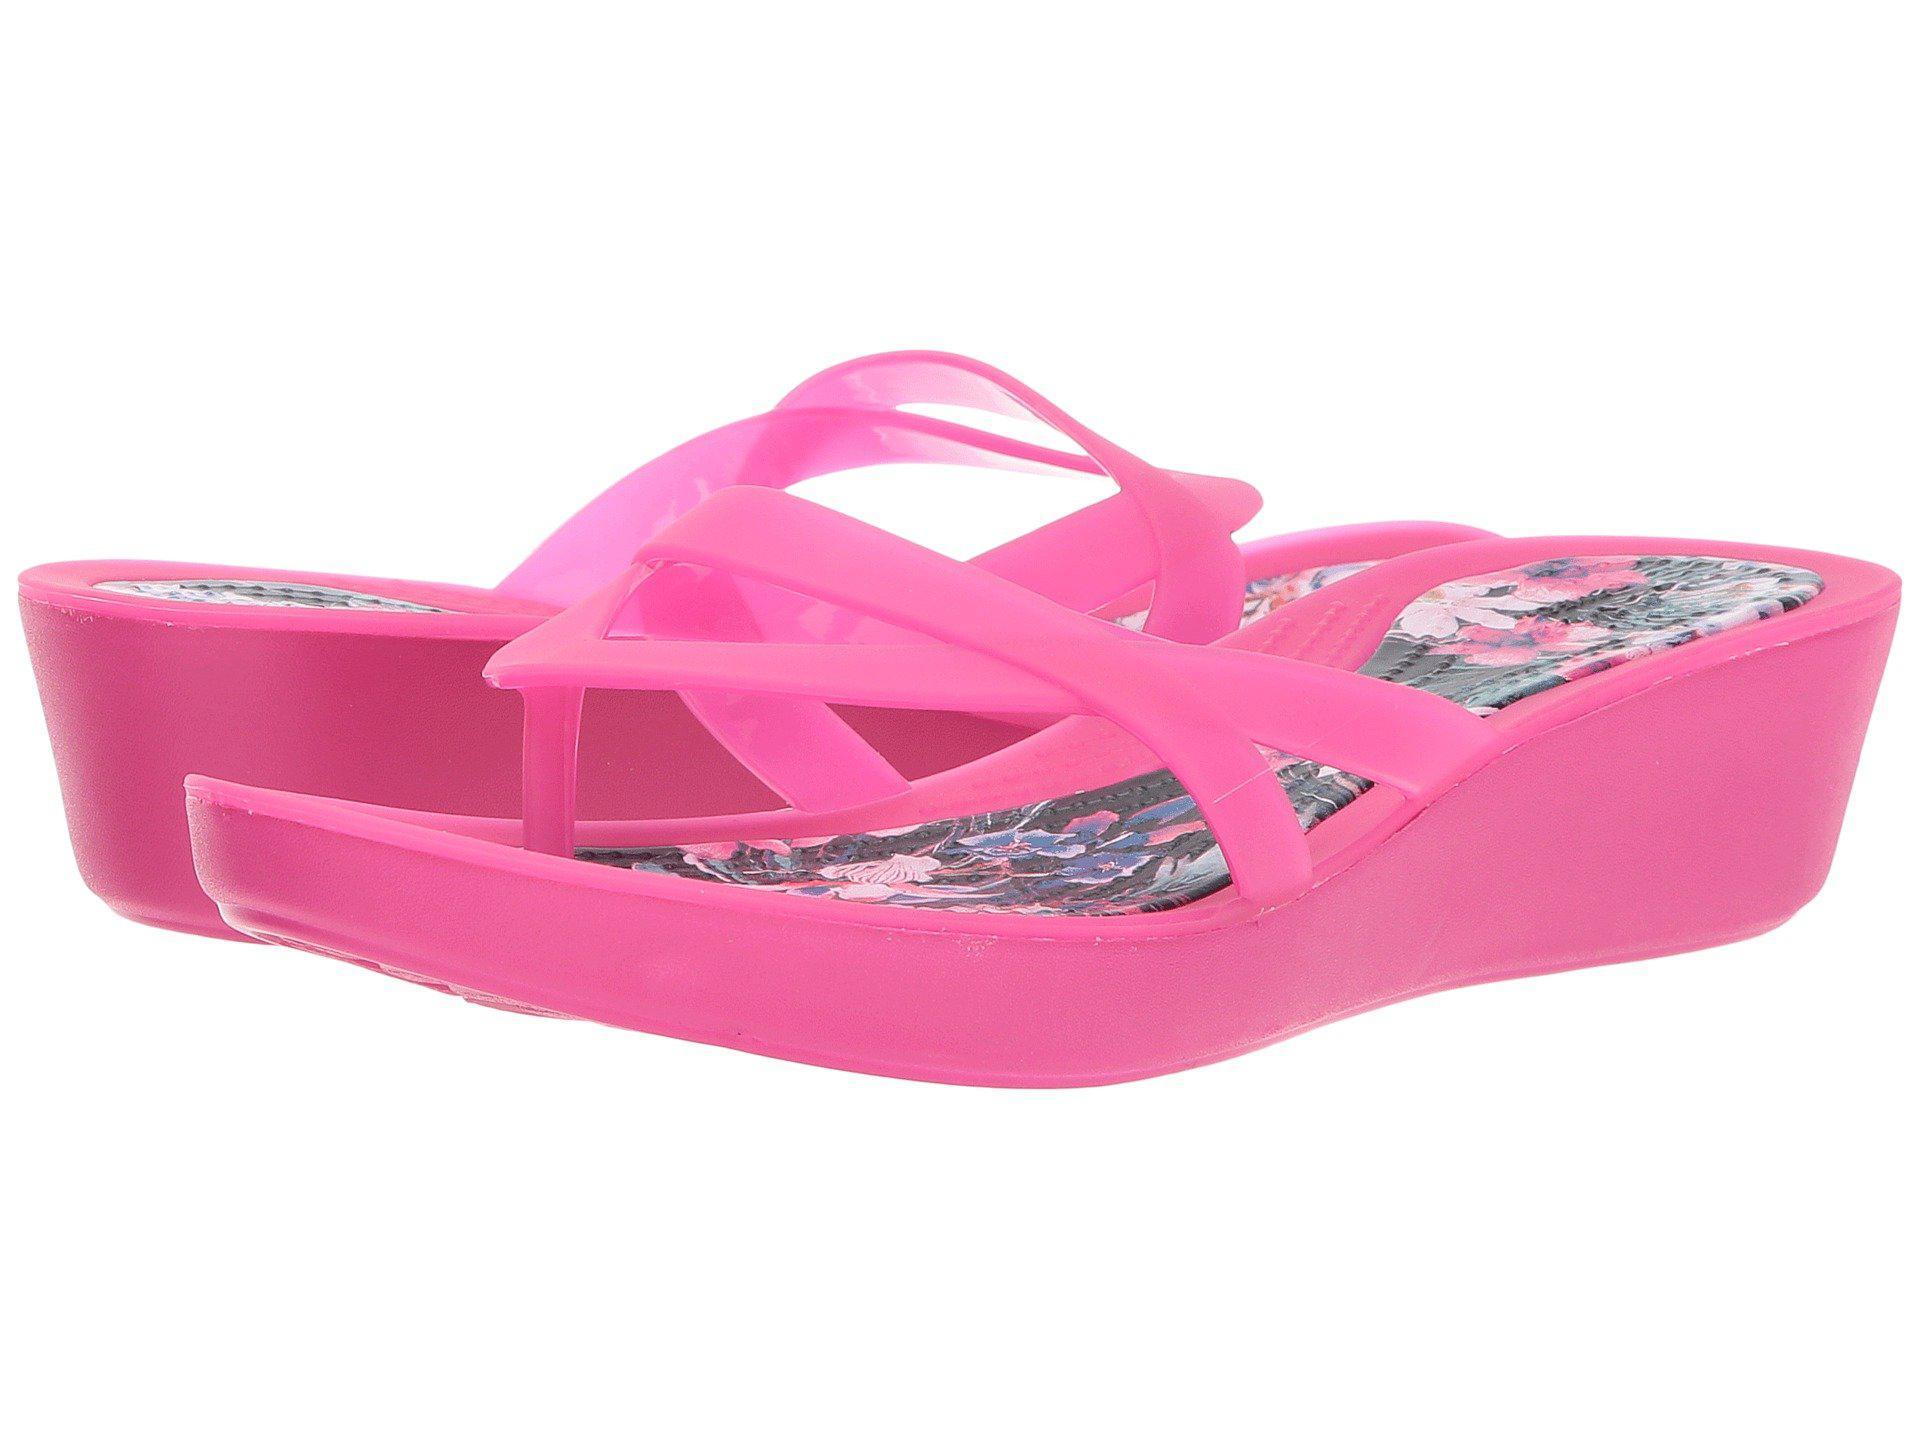 f0a37fca506 Crocstm candy pinktropical isabella print wedge flip jpg 1920x1440 Pink  croc wedges